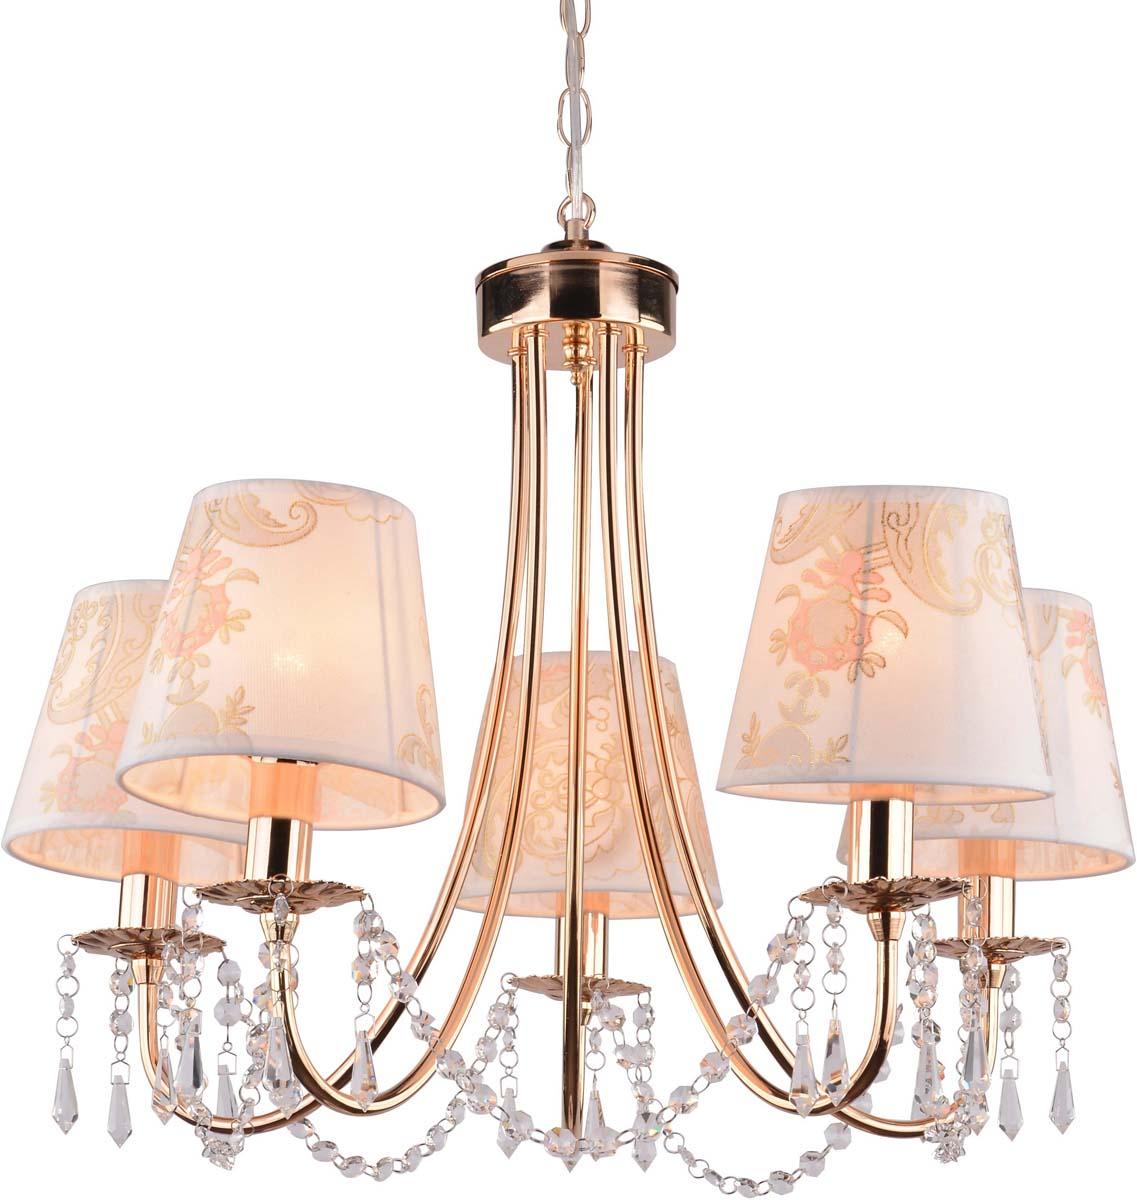 Светильник подвесной Arte Lamp Armonico, 5 х E14, 40 W. A5008LM-5GO люстра на штанге arte lamp modello a6119pl 5go